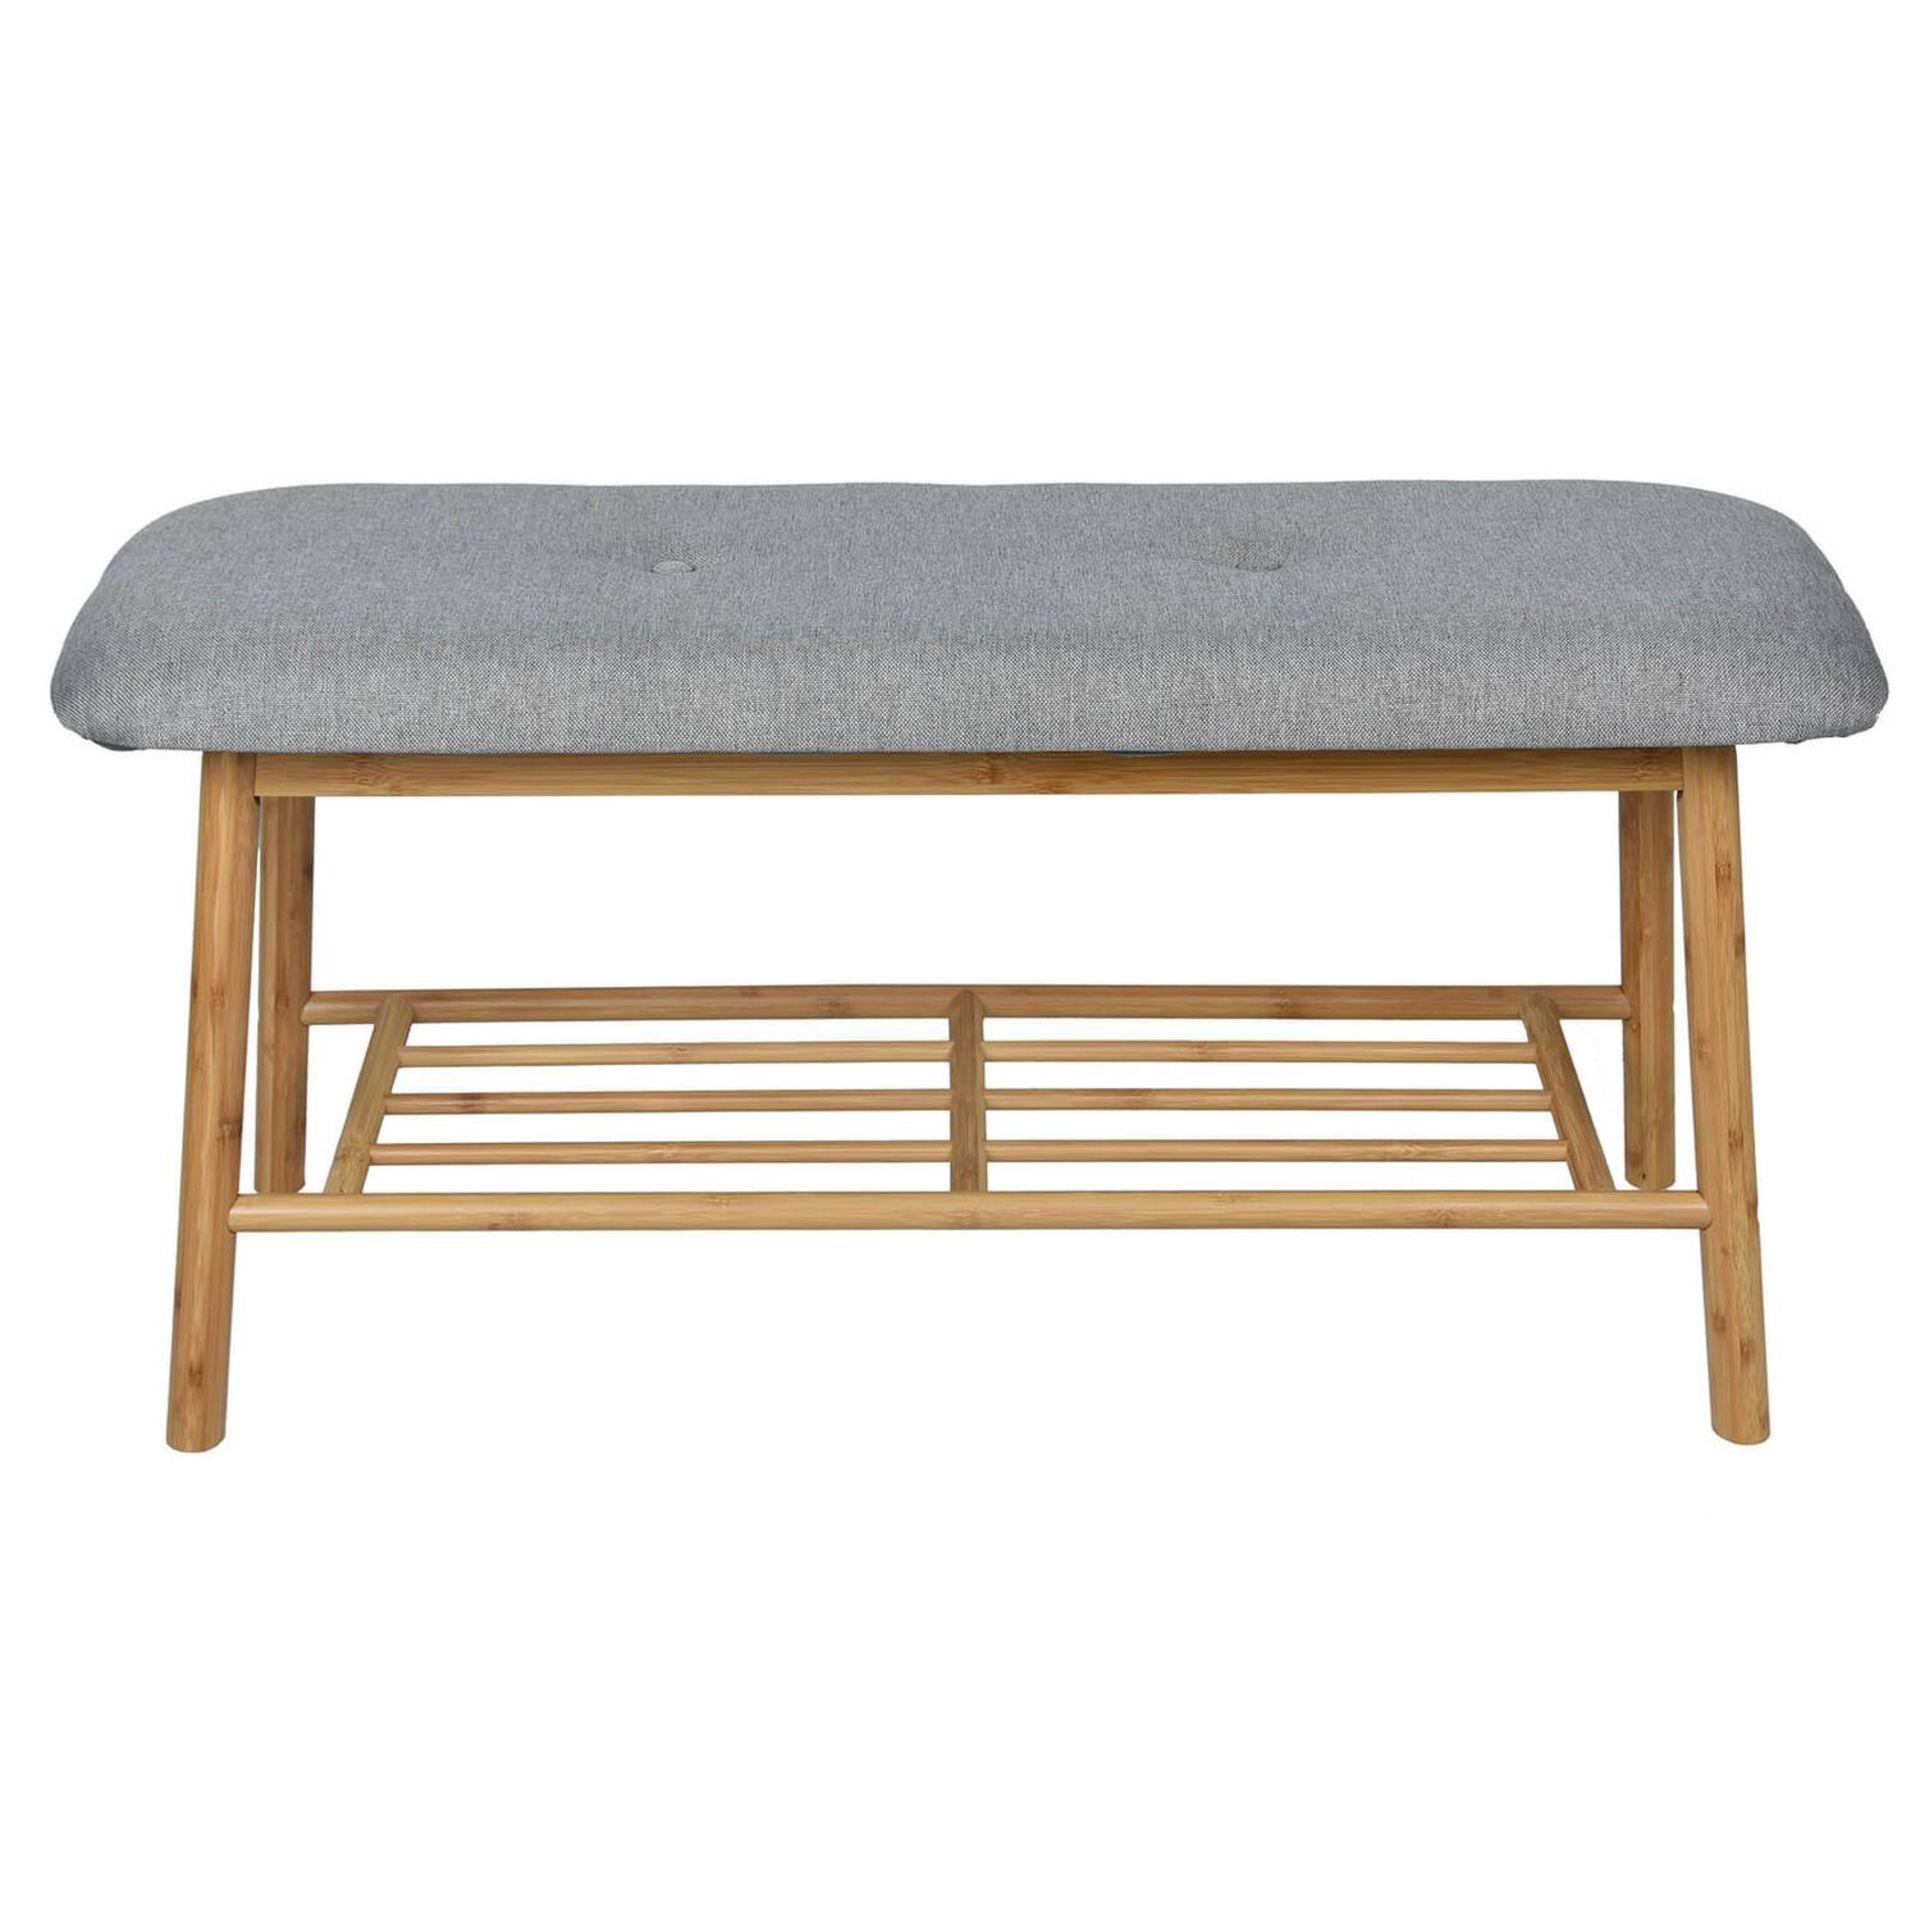 (3E) 2x Items. 1x Living Elements Bamboo Shoe Bench With Grey Cushion Seat. 1x VidaXL.com Radiator - Image 2 of 7